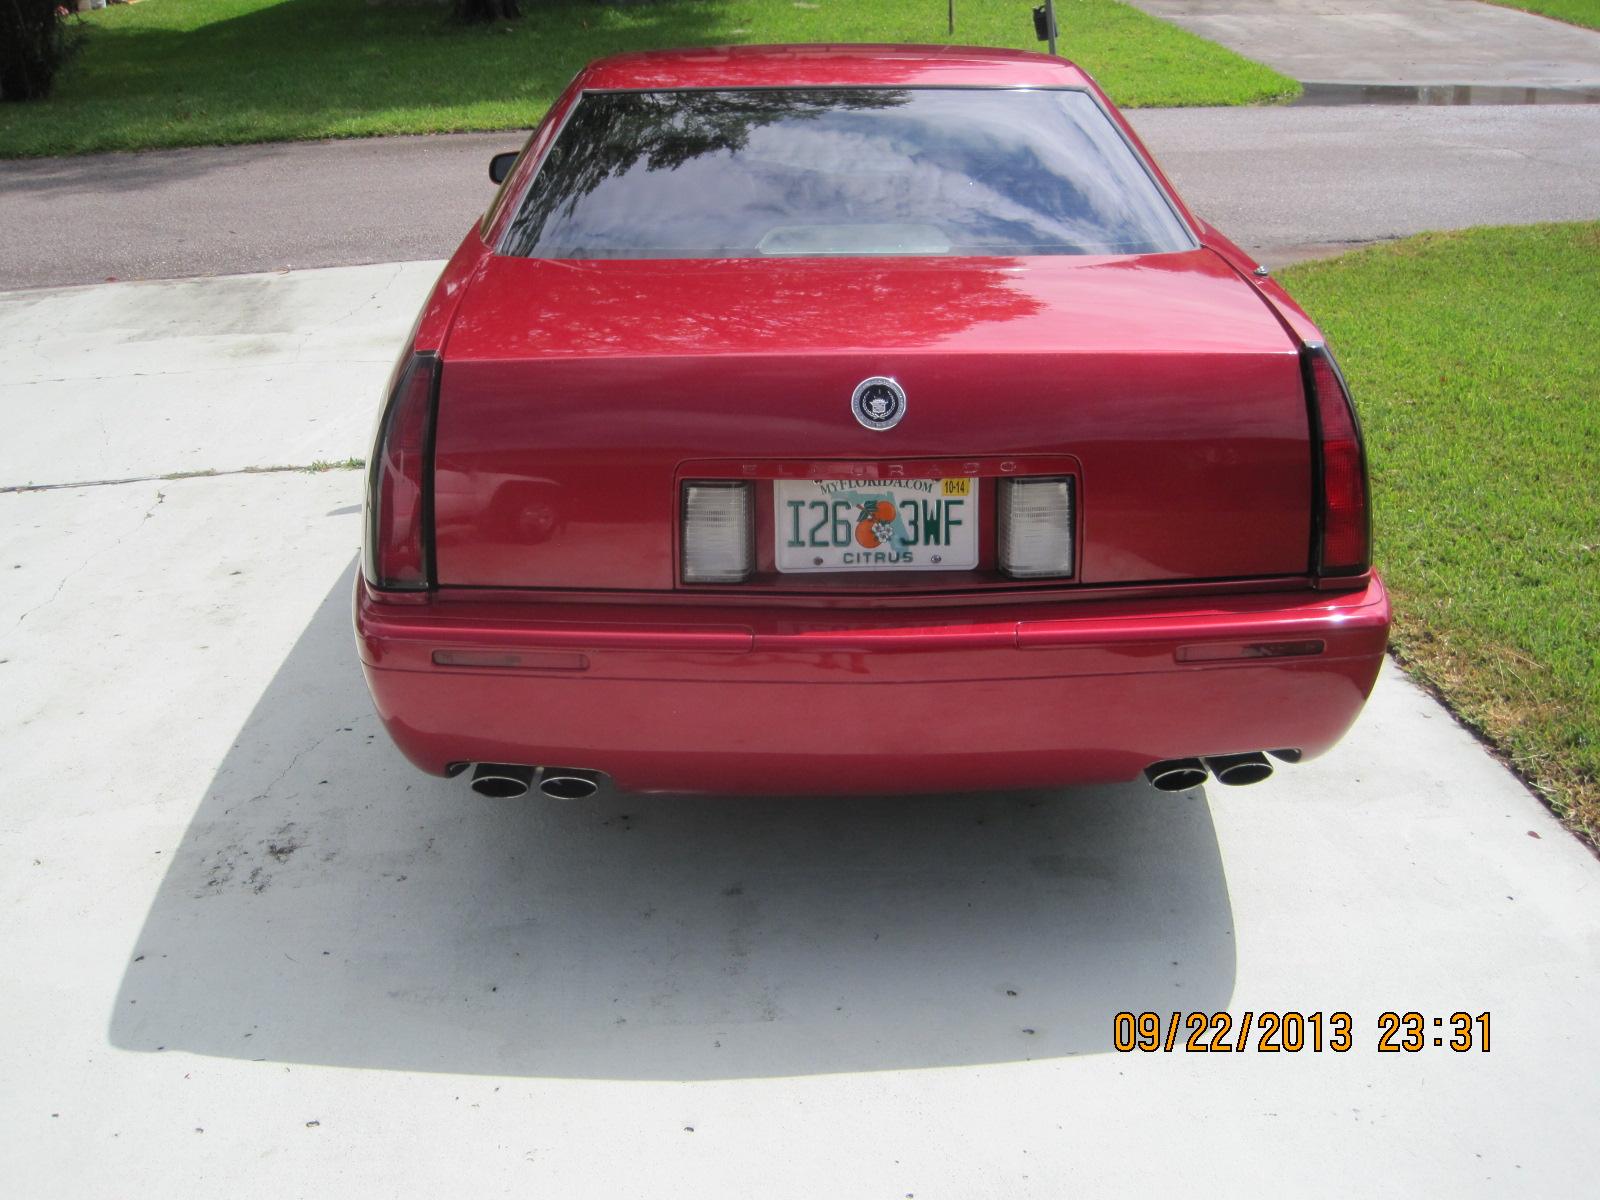 2001 Cadillac Eldorado ETC Coupe picture, exterior